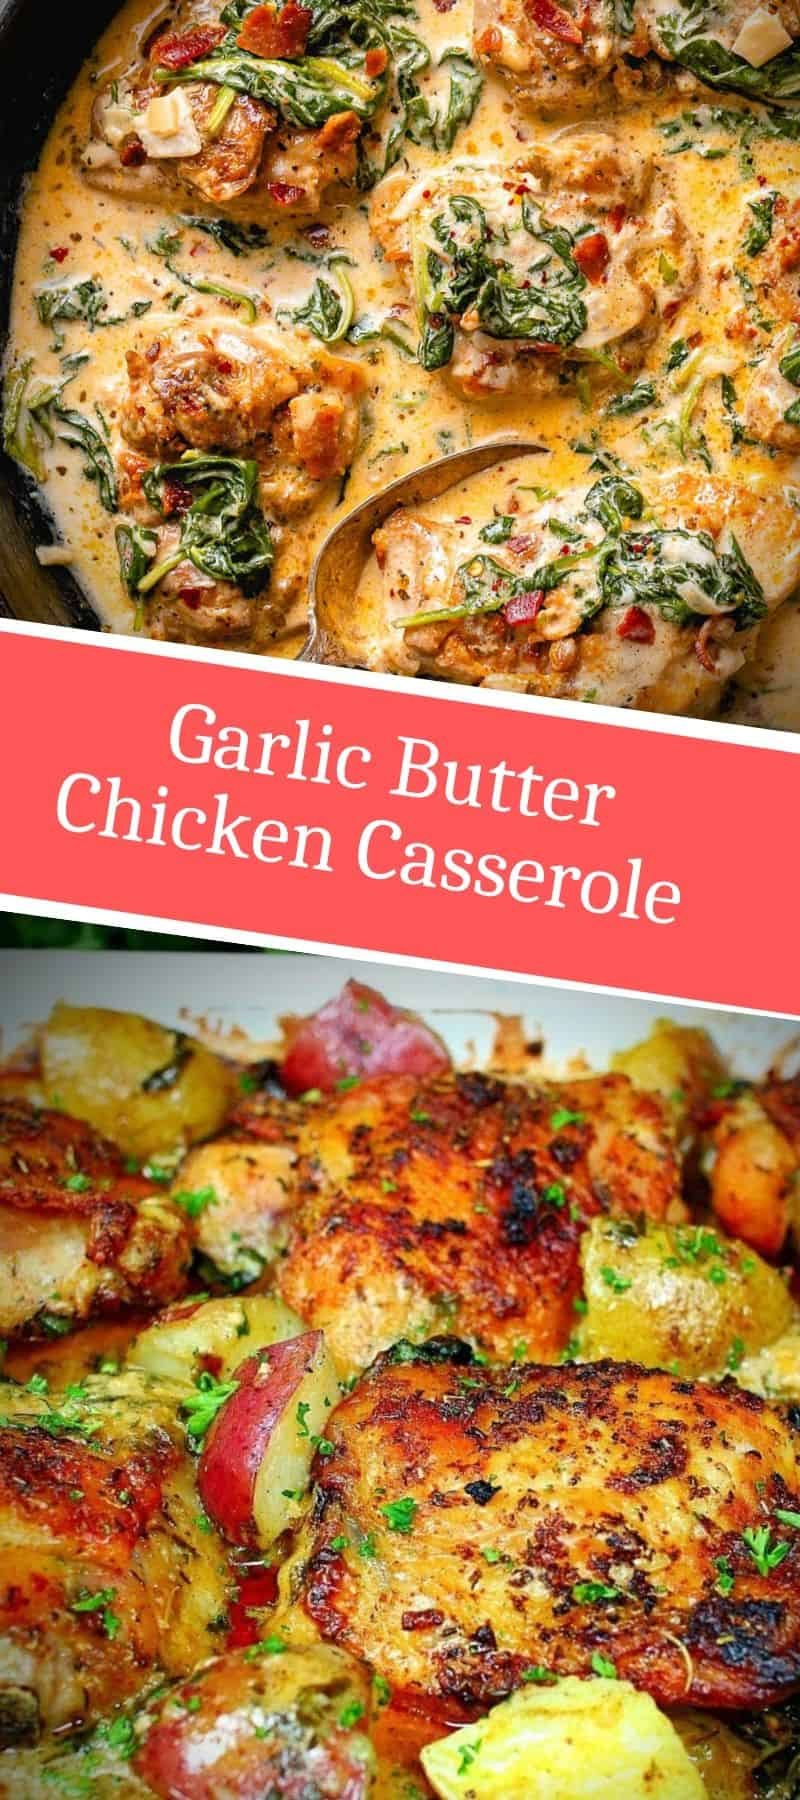 Garlic Butter Chicken Casserole Recipe 3